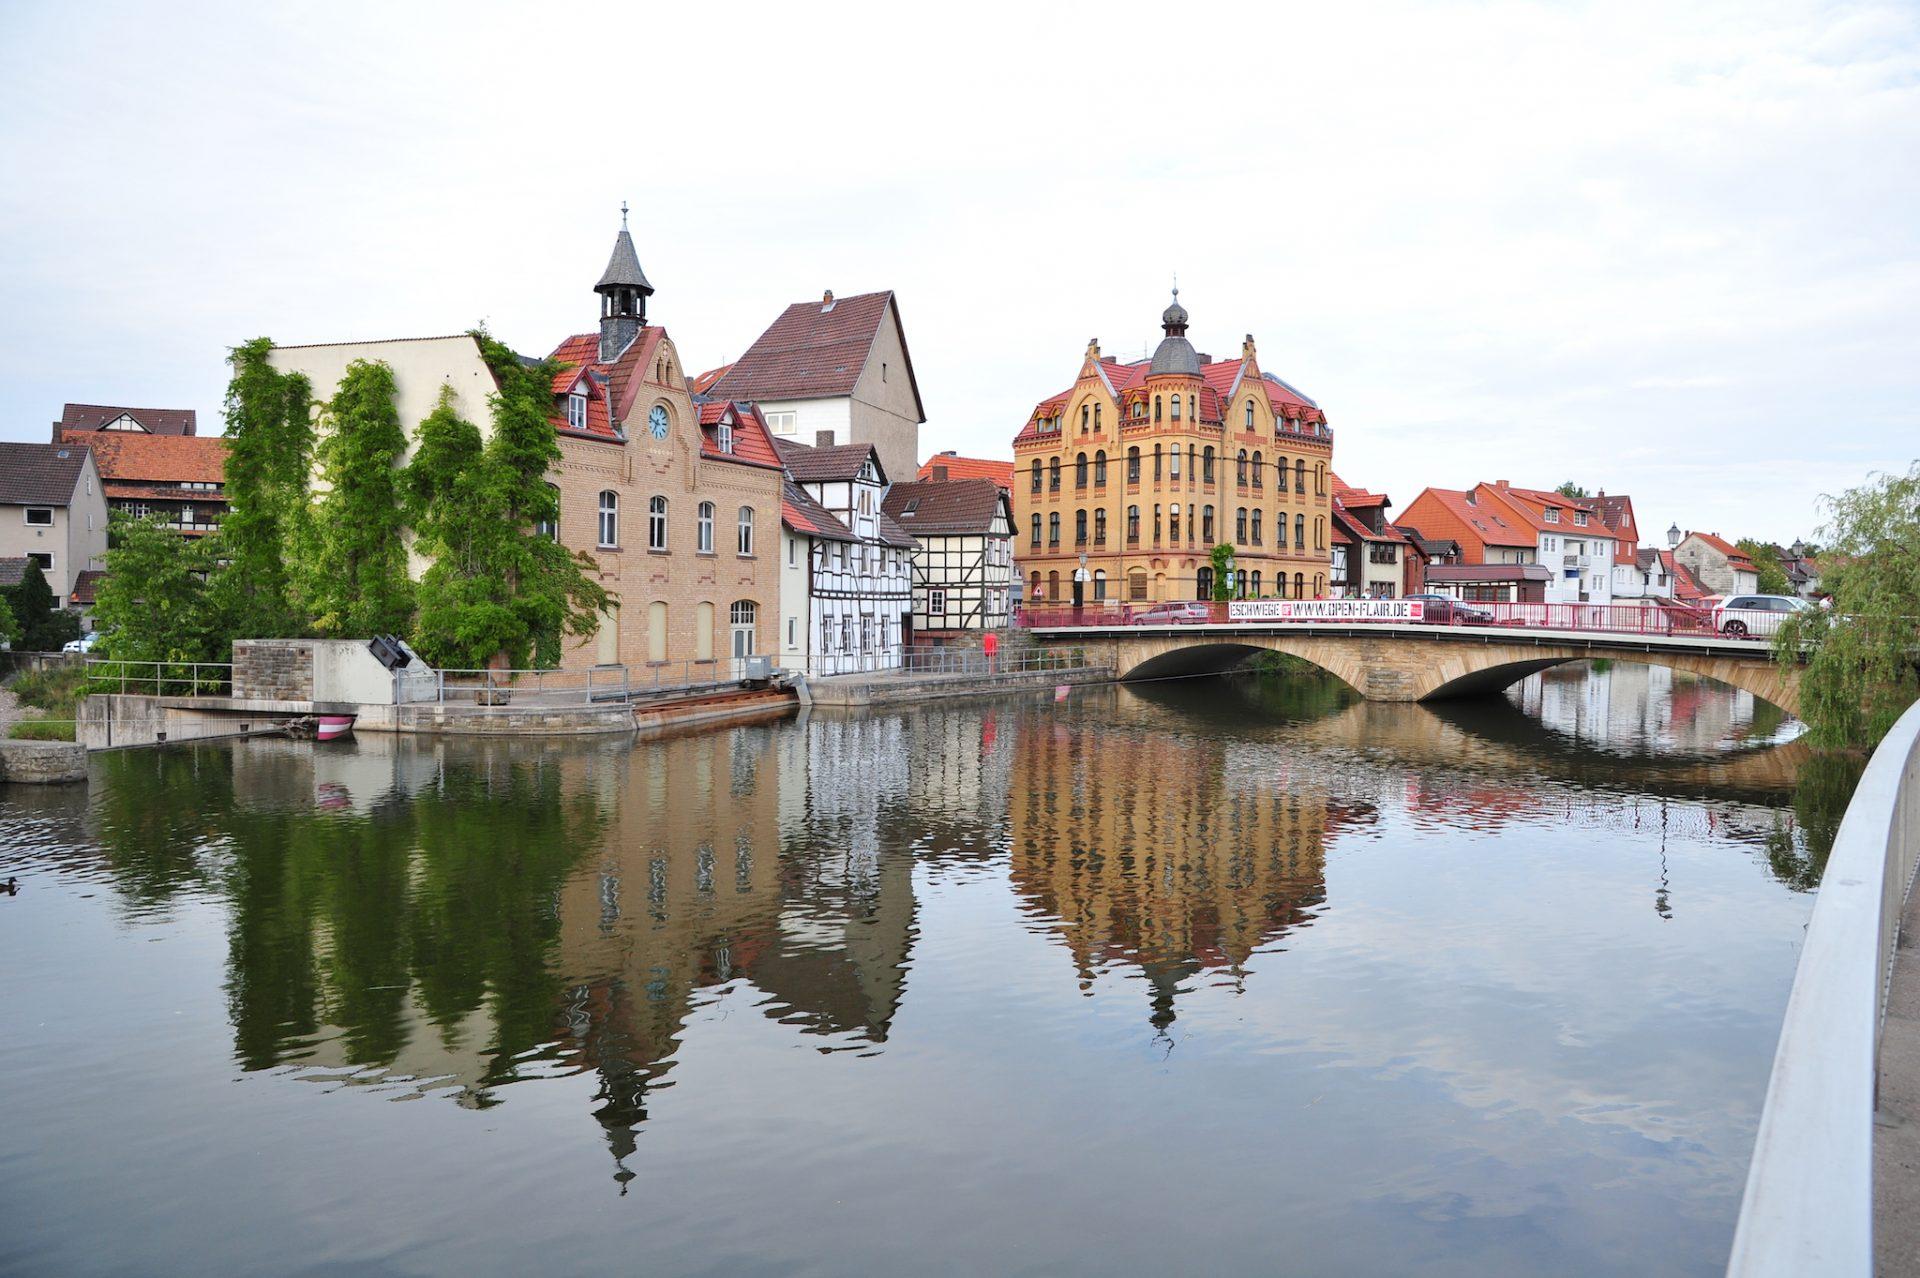 Eschwege, Werrabrücke